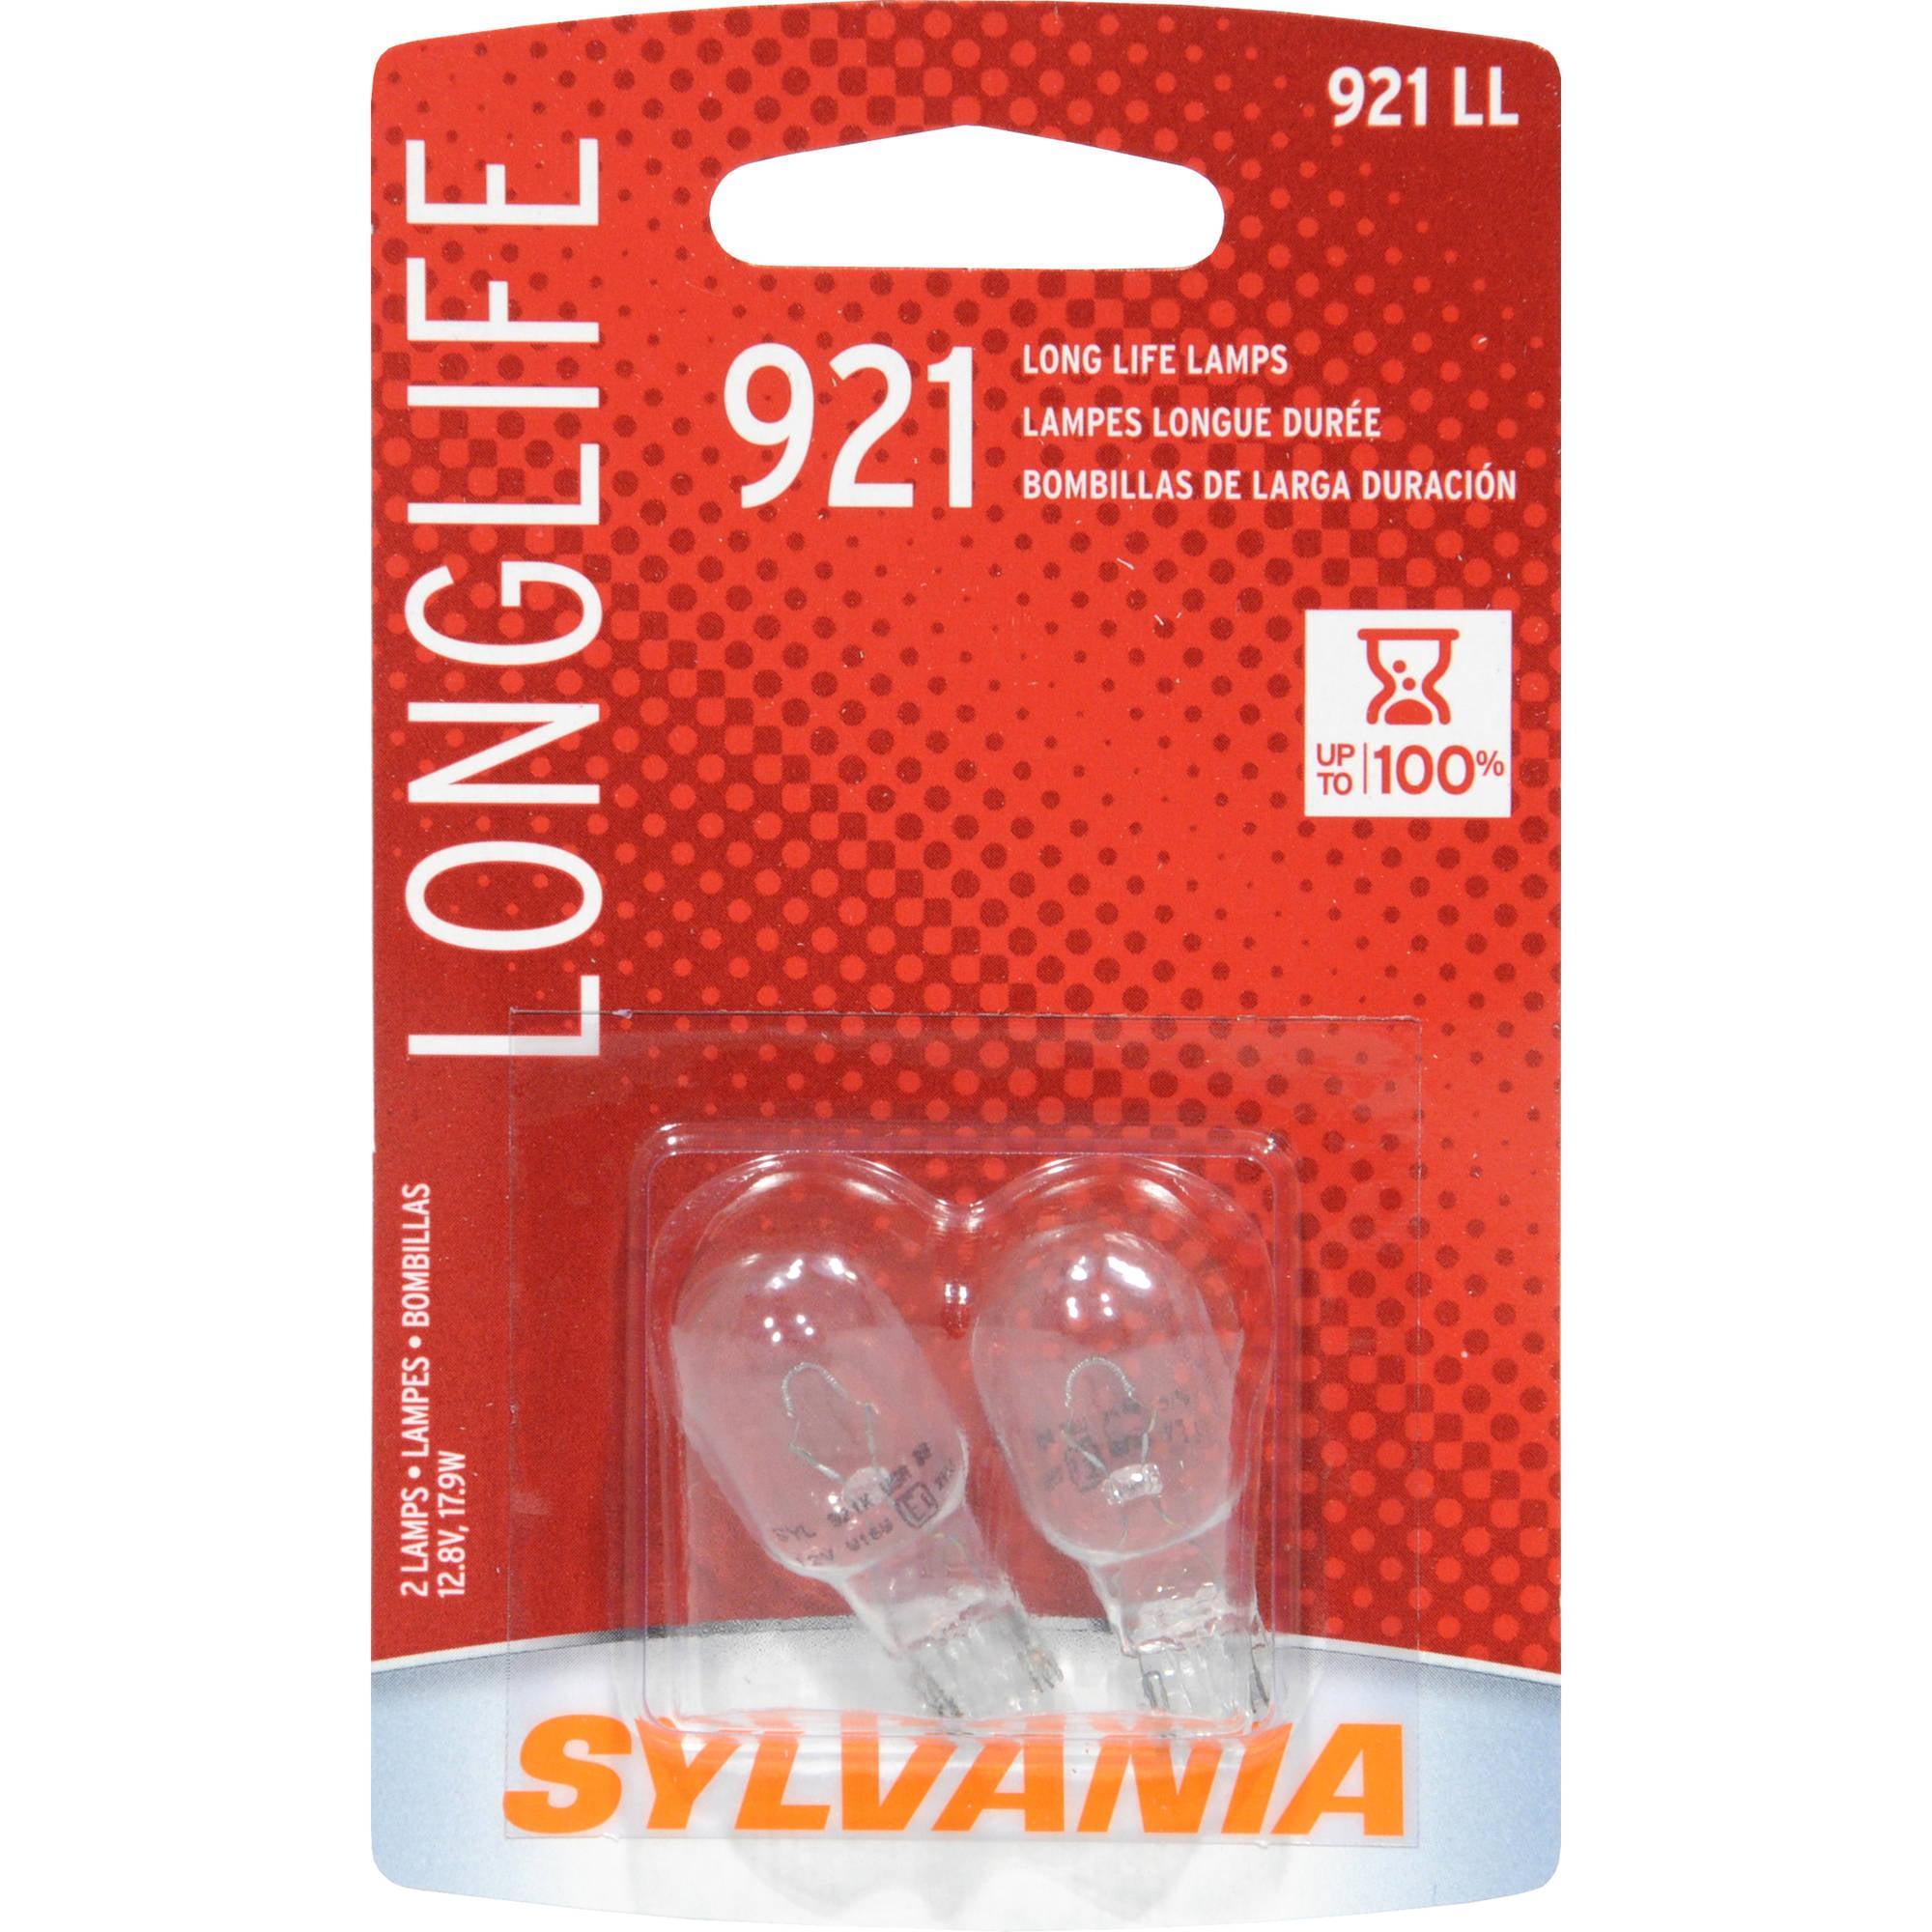 Sylvania 921 Long-Life Miniature Bulb, Twin Pack